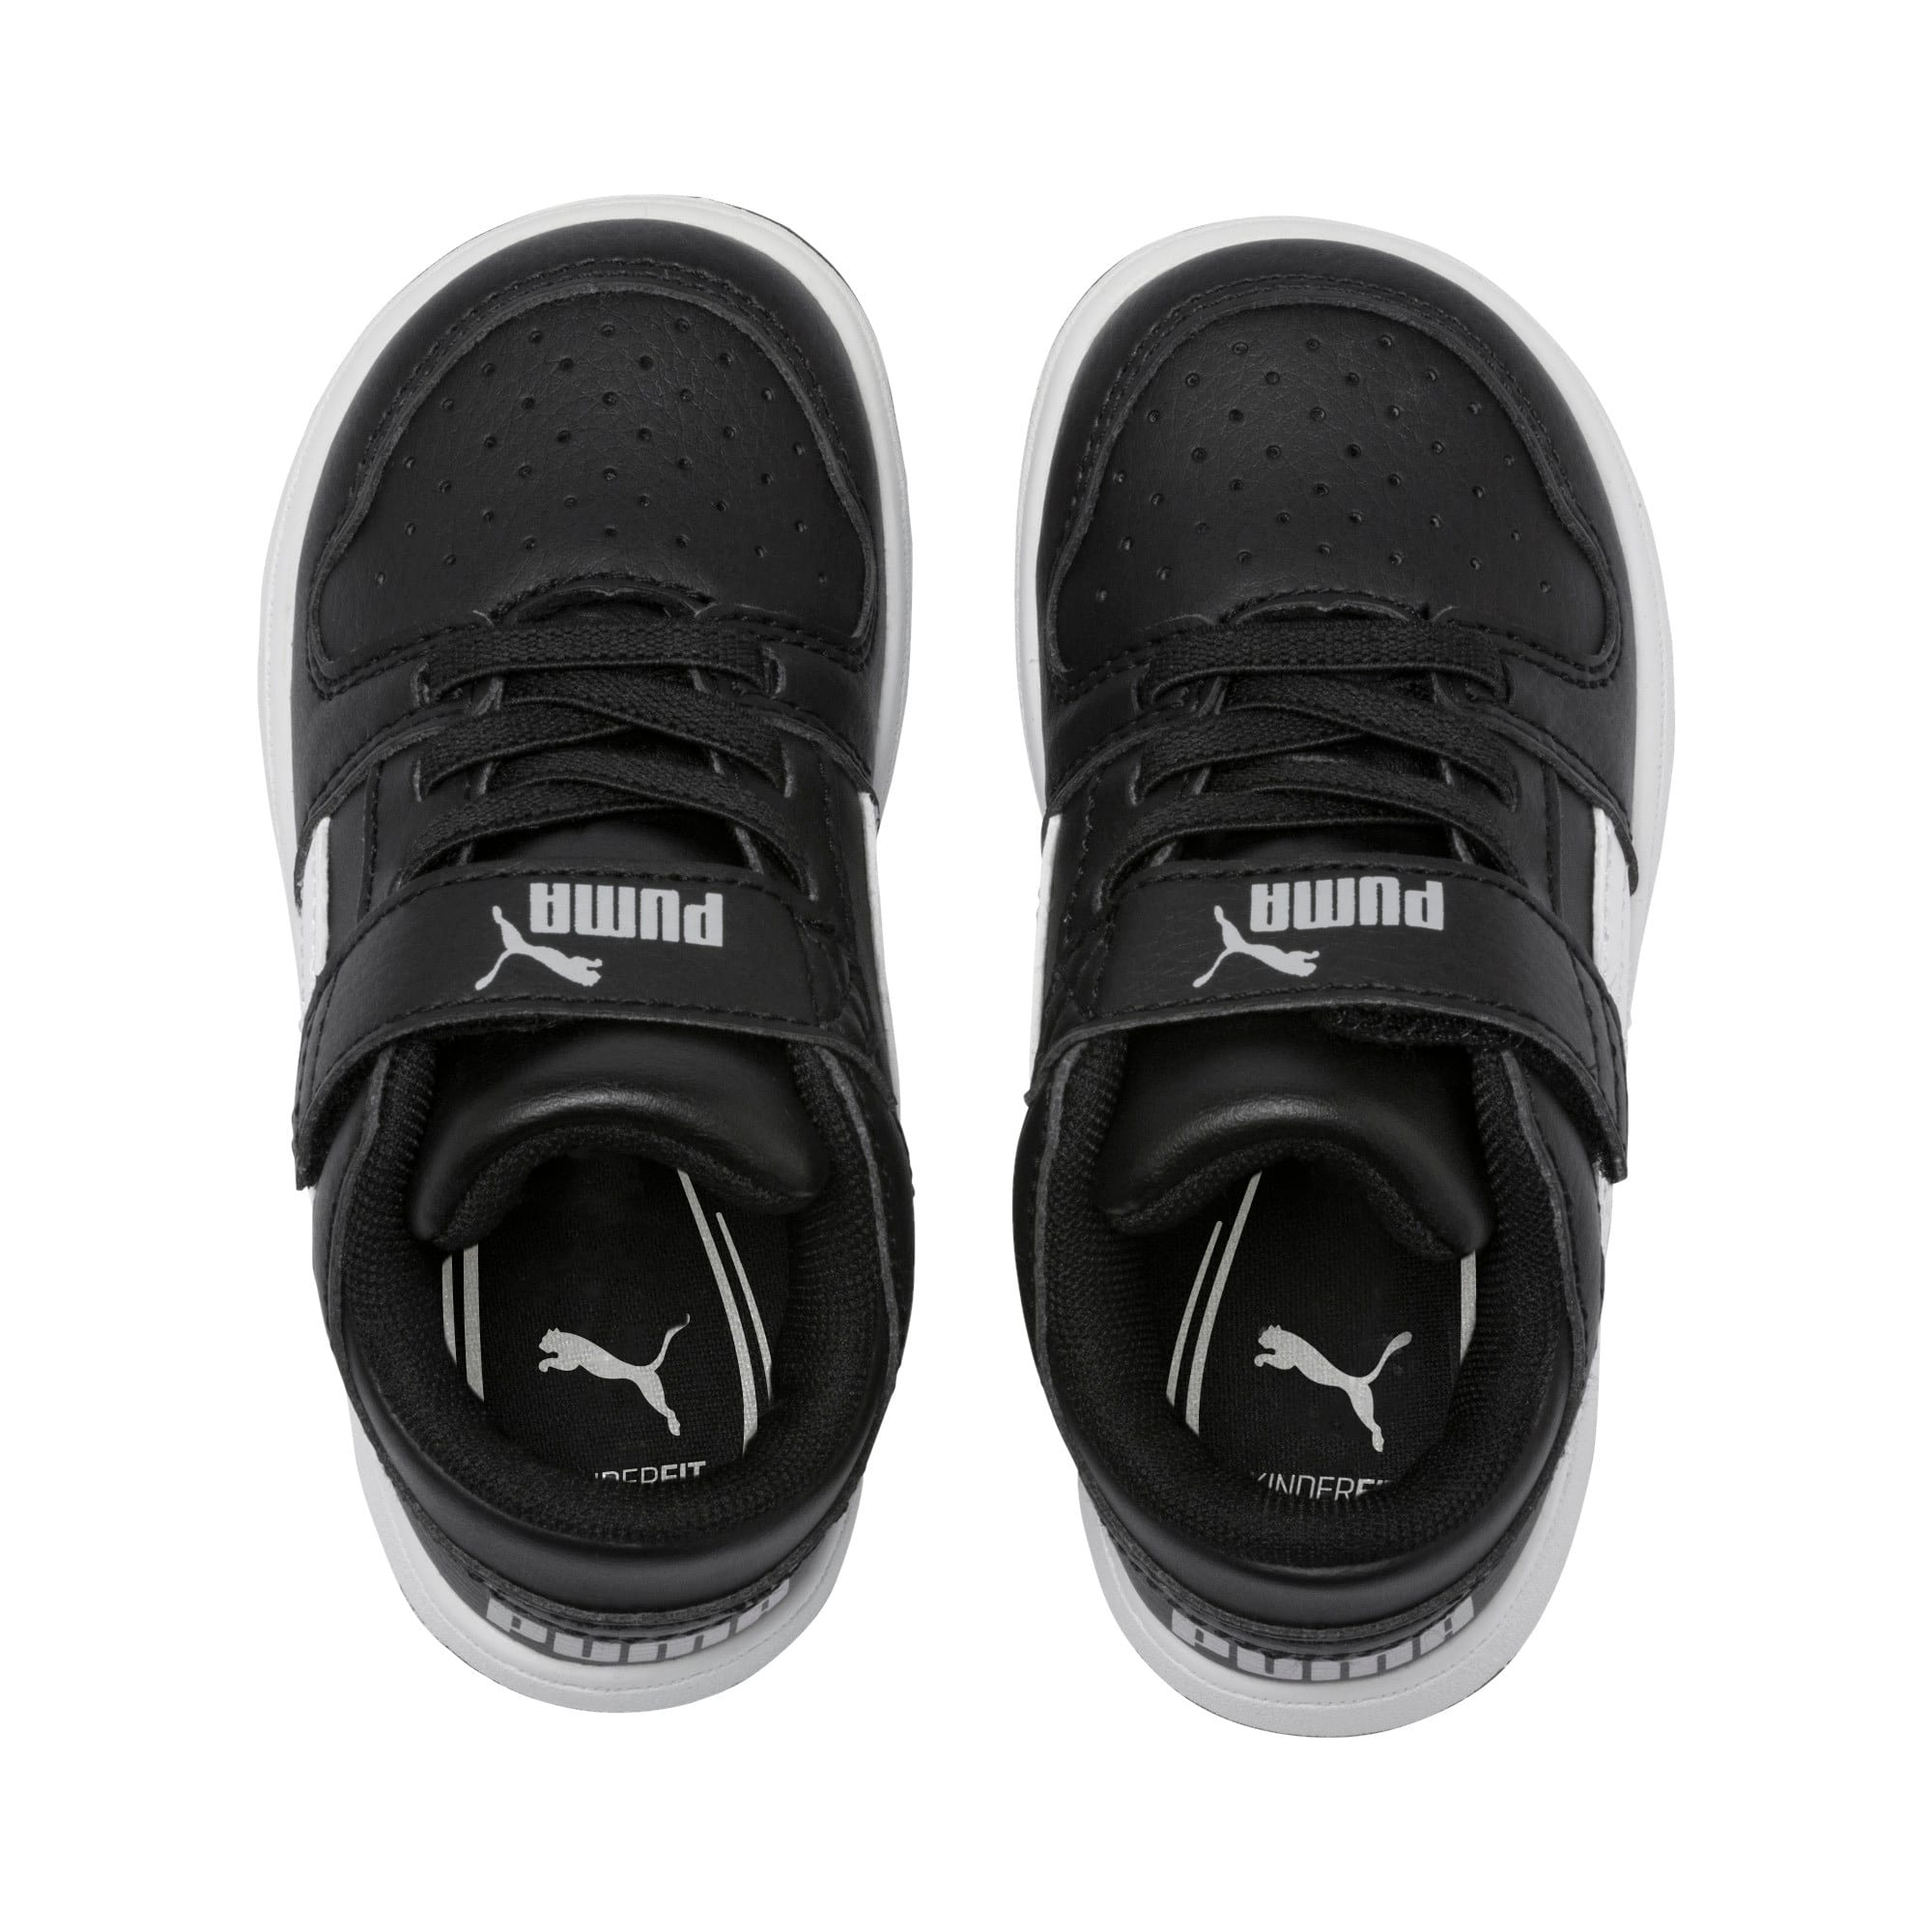 Miniatura 6 de Zapatos deportivos PUMA Rebound LayUp Lo para INF, Puma Black-Blanco-High Rise, mediano